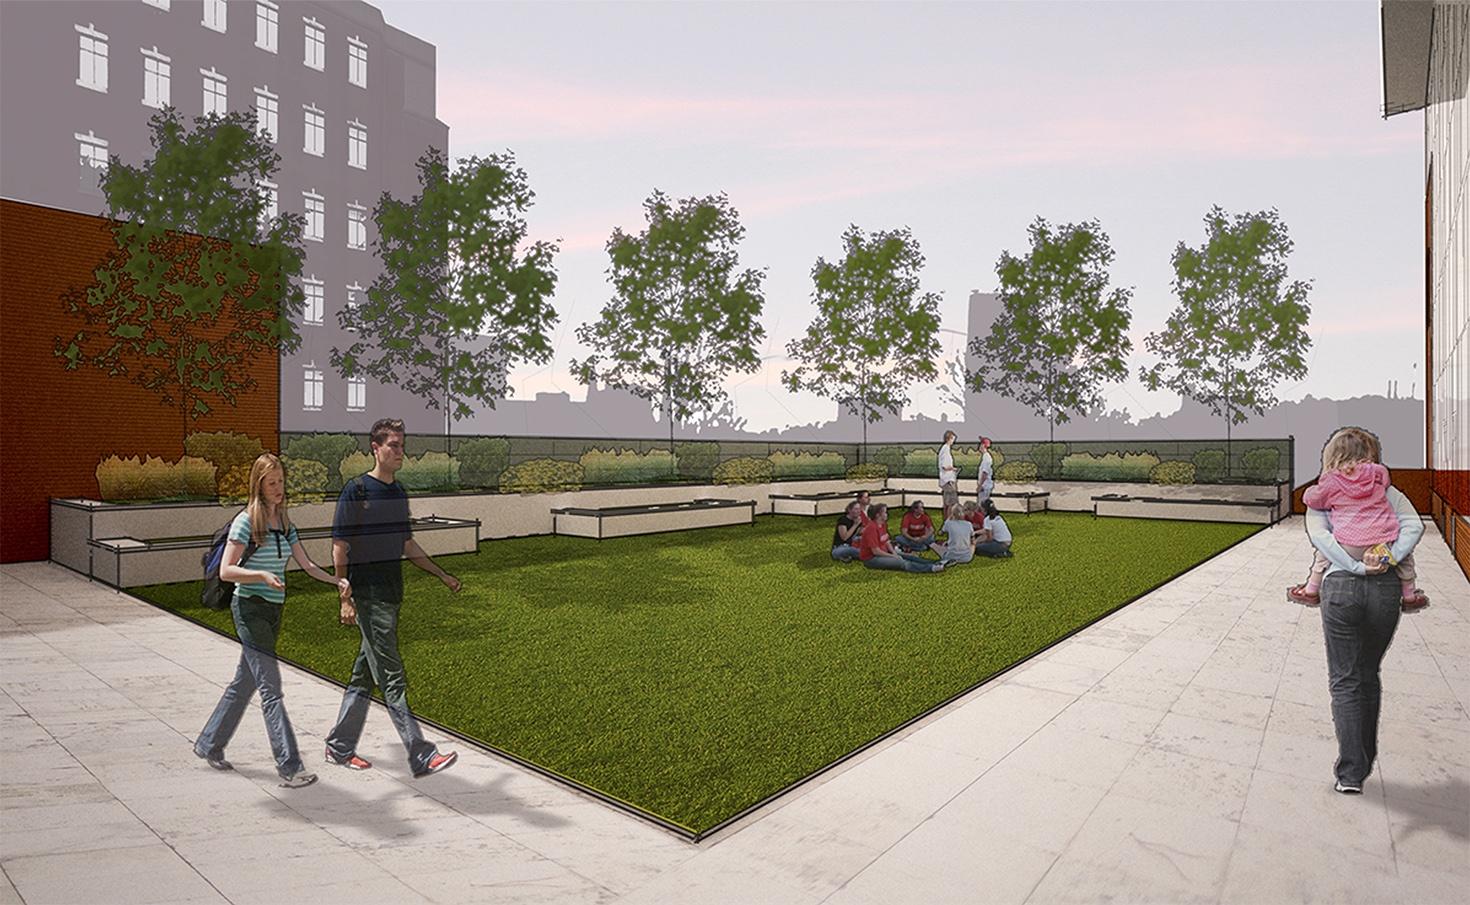 Rooftop Courtyard - Sculpture Garden and Performance Space for an Urban High School